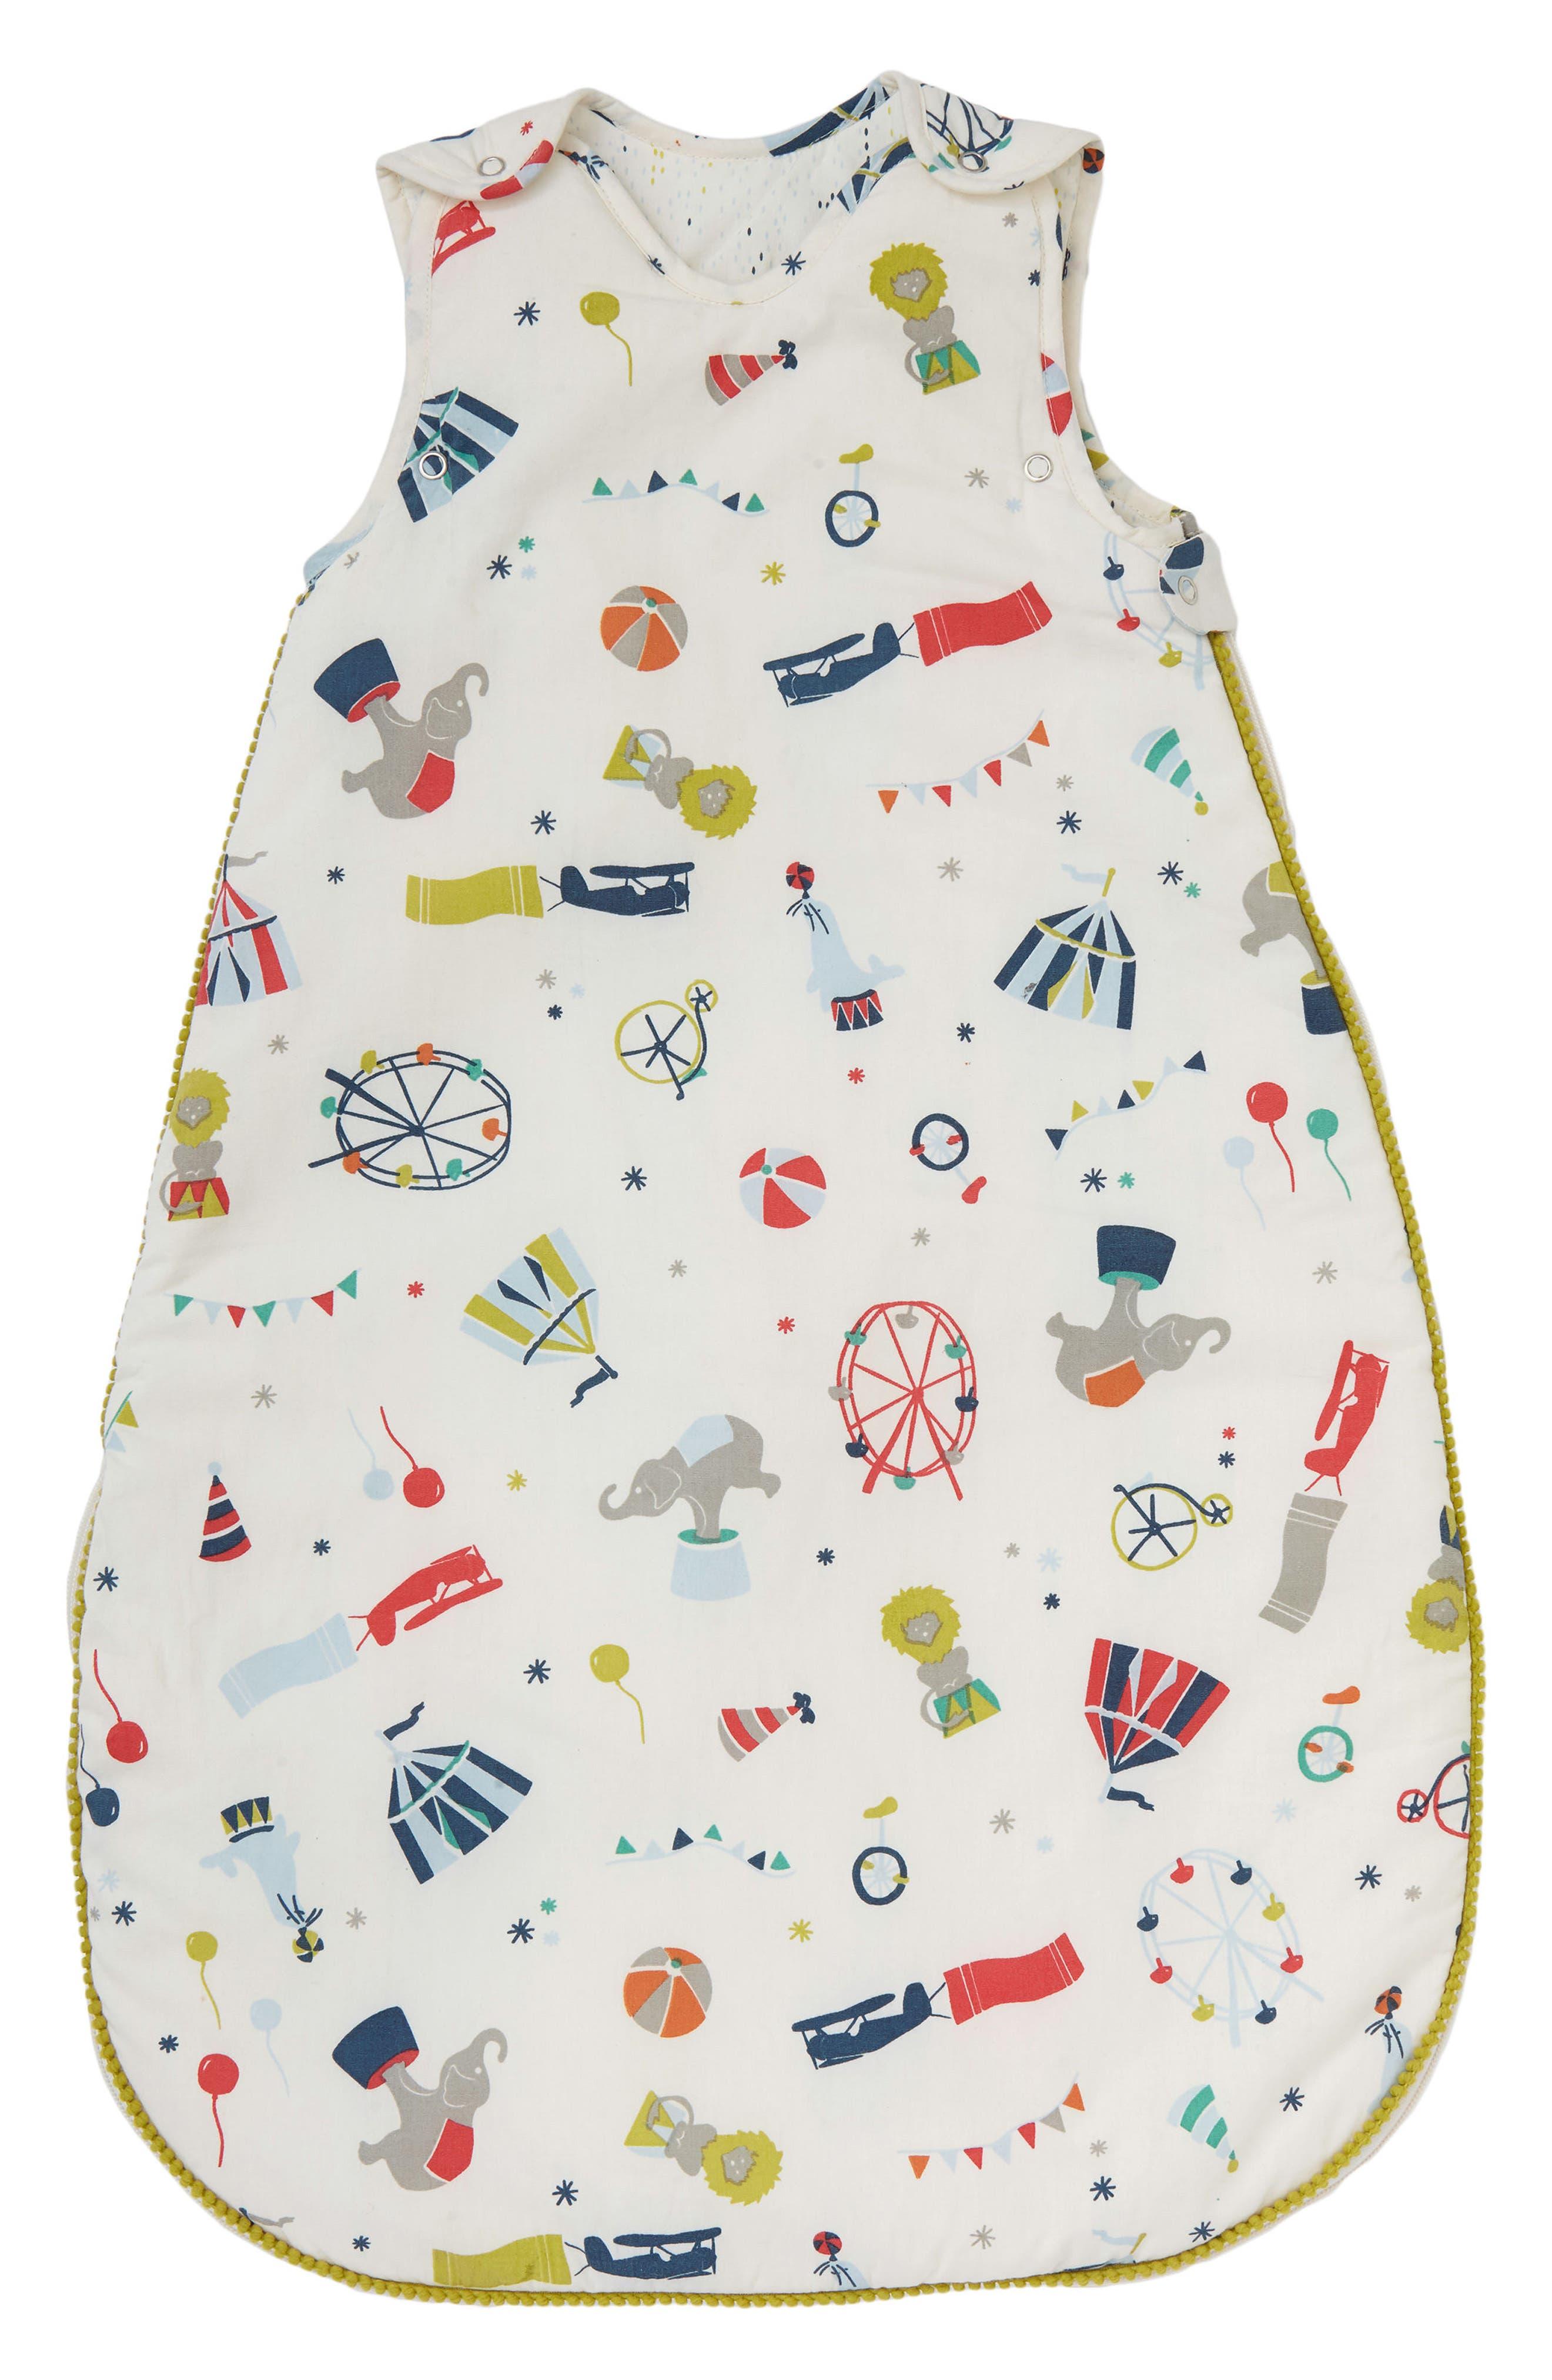 Big Top Print Cotton Wearable Blanket,                         Main,                         color, 450